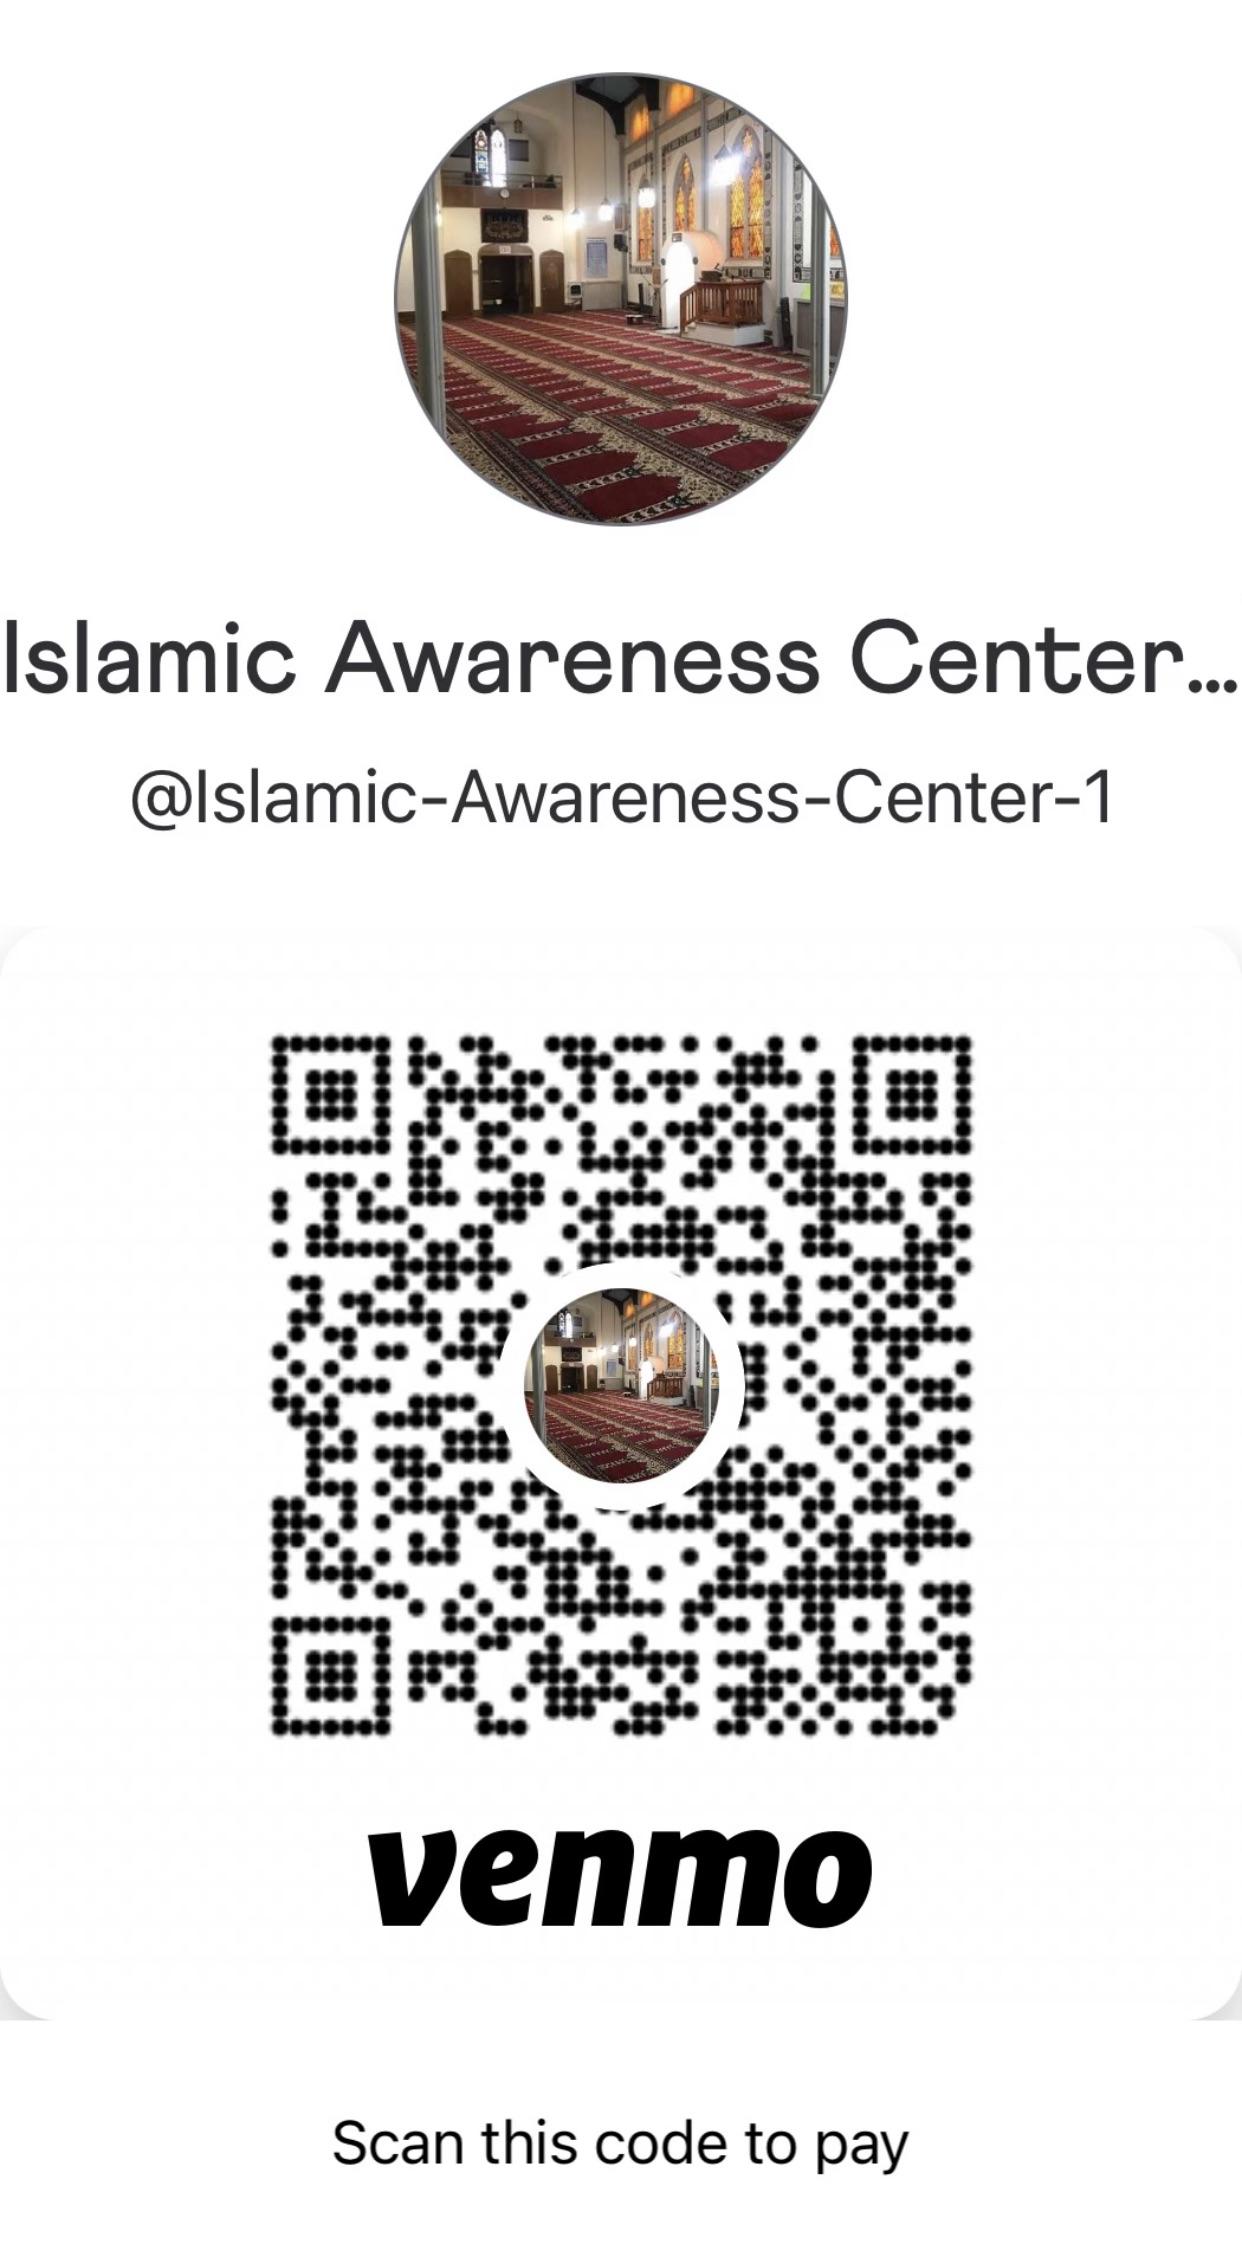 Venmo qr code, @islamic-awareness-center-1